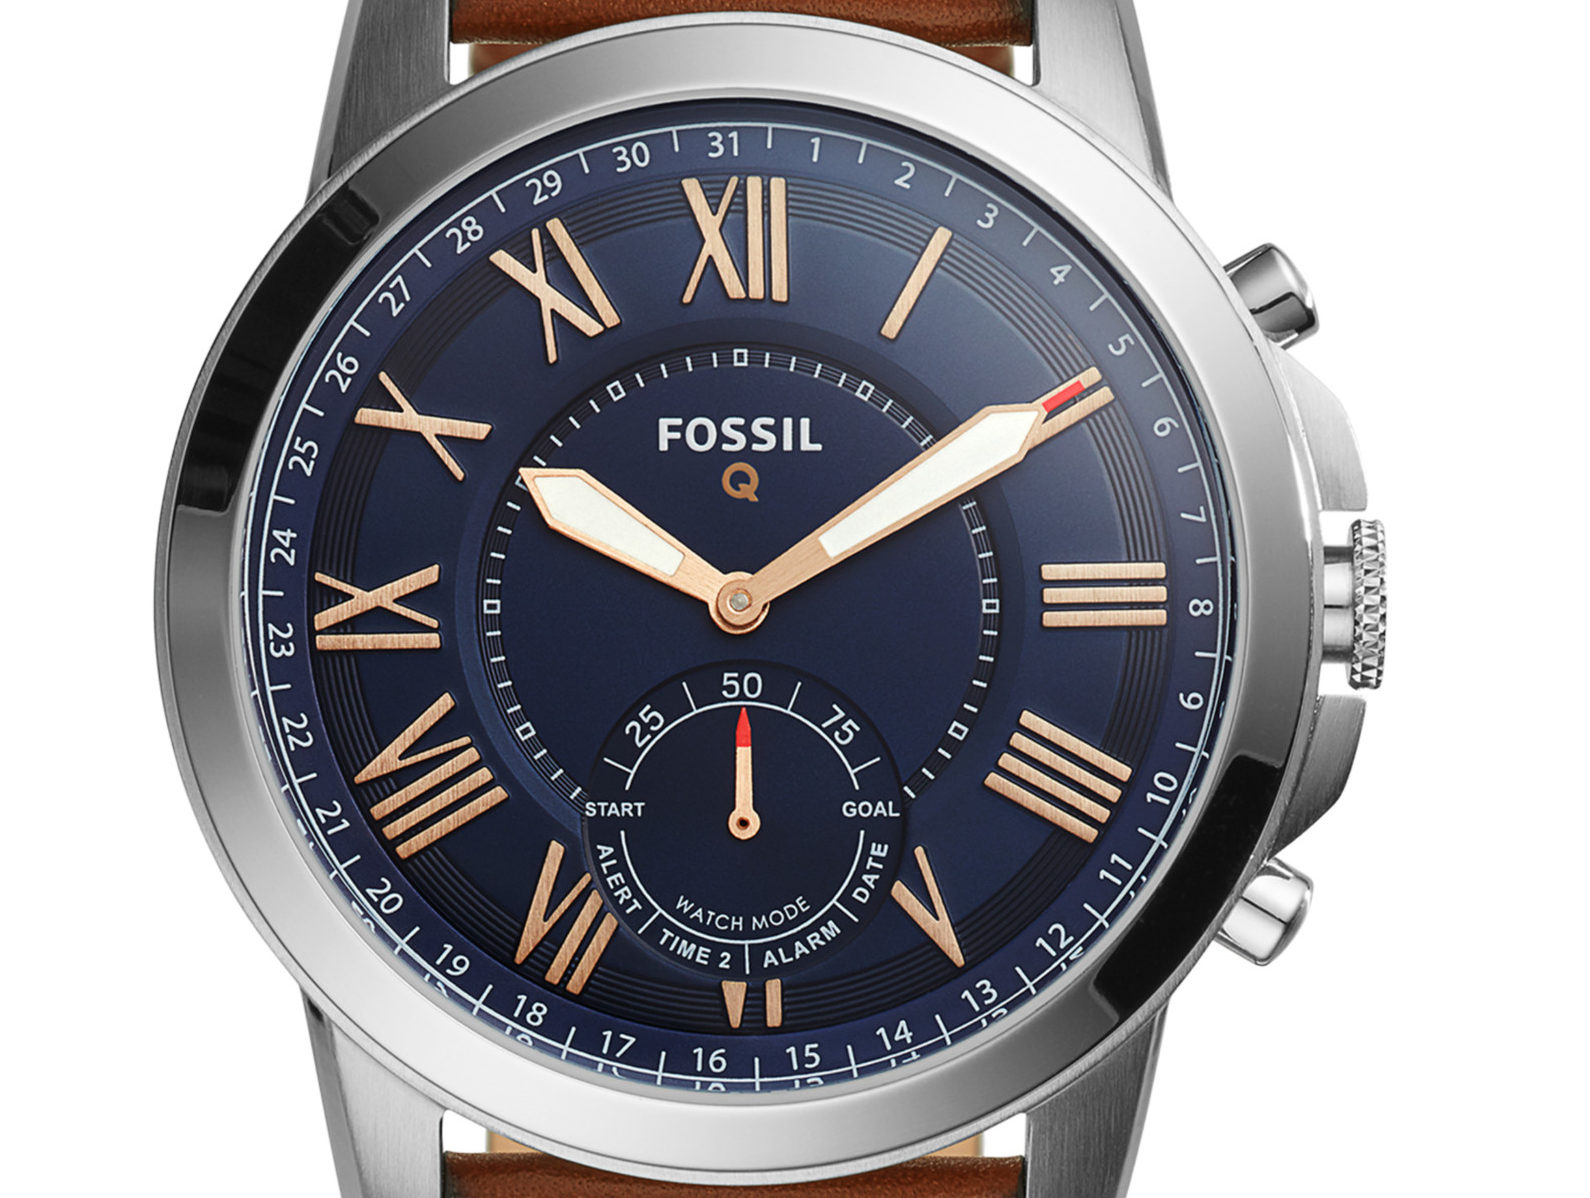 Fossil Q